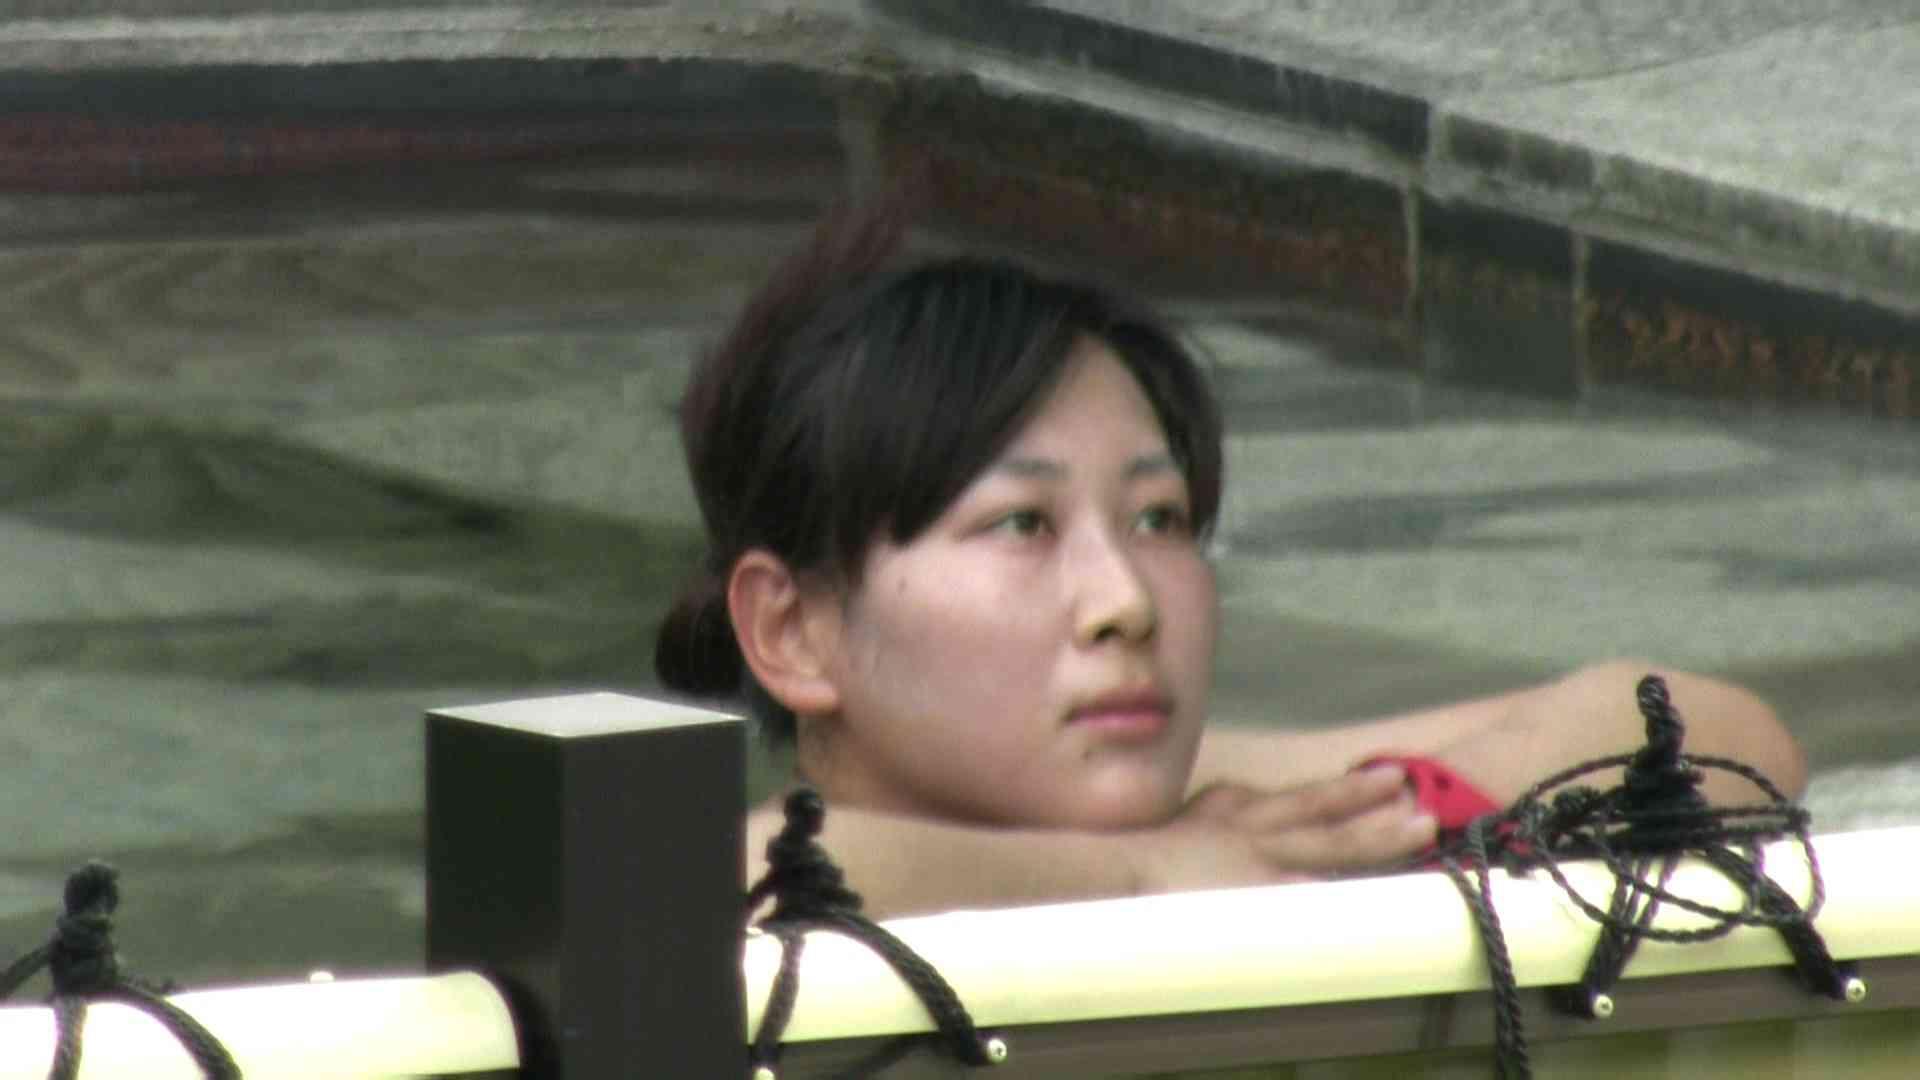 Aquaな露天風呂Vol.665 綺麗なOLたち  85枚 69